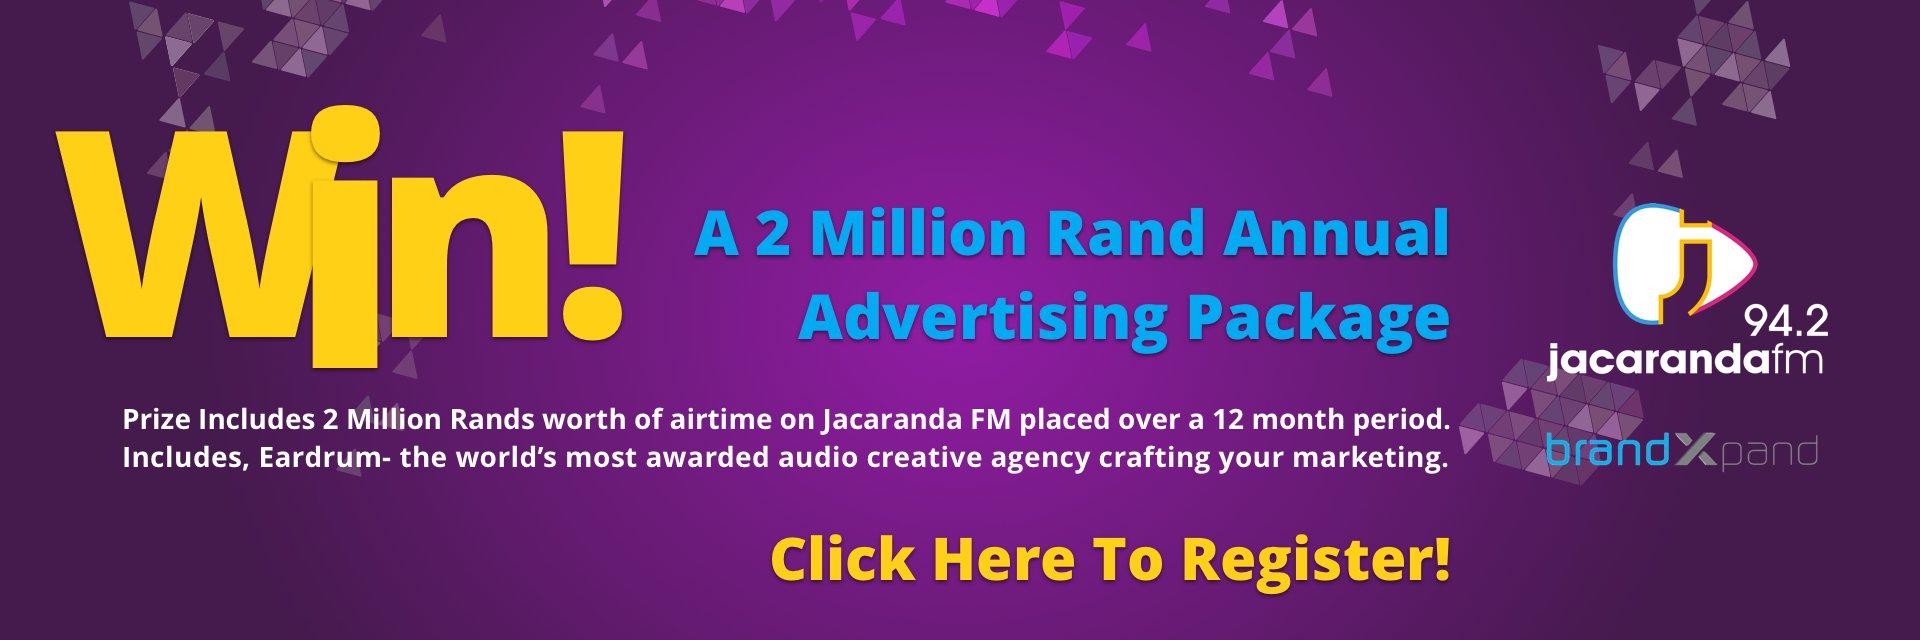 brandxpand.info/jacaranda-2019-contest.html